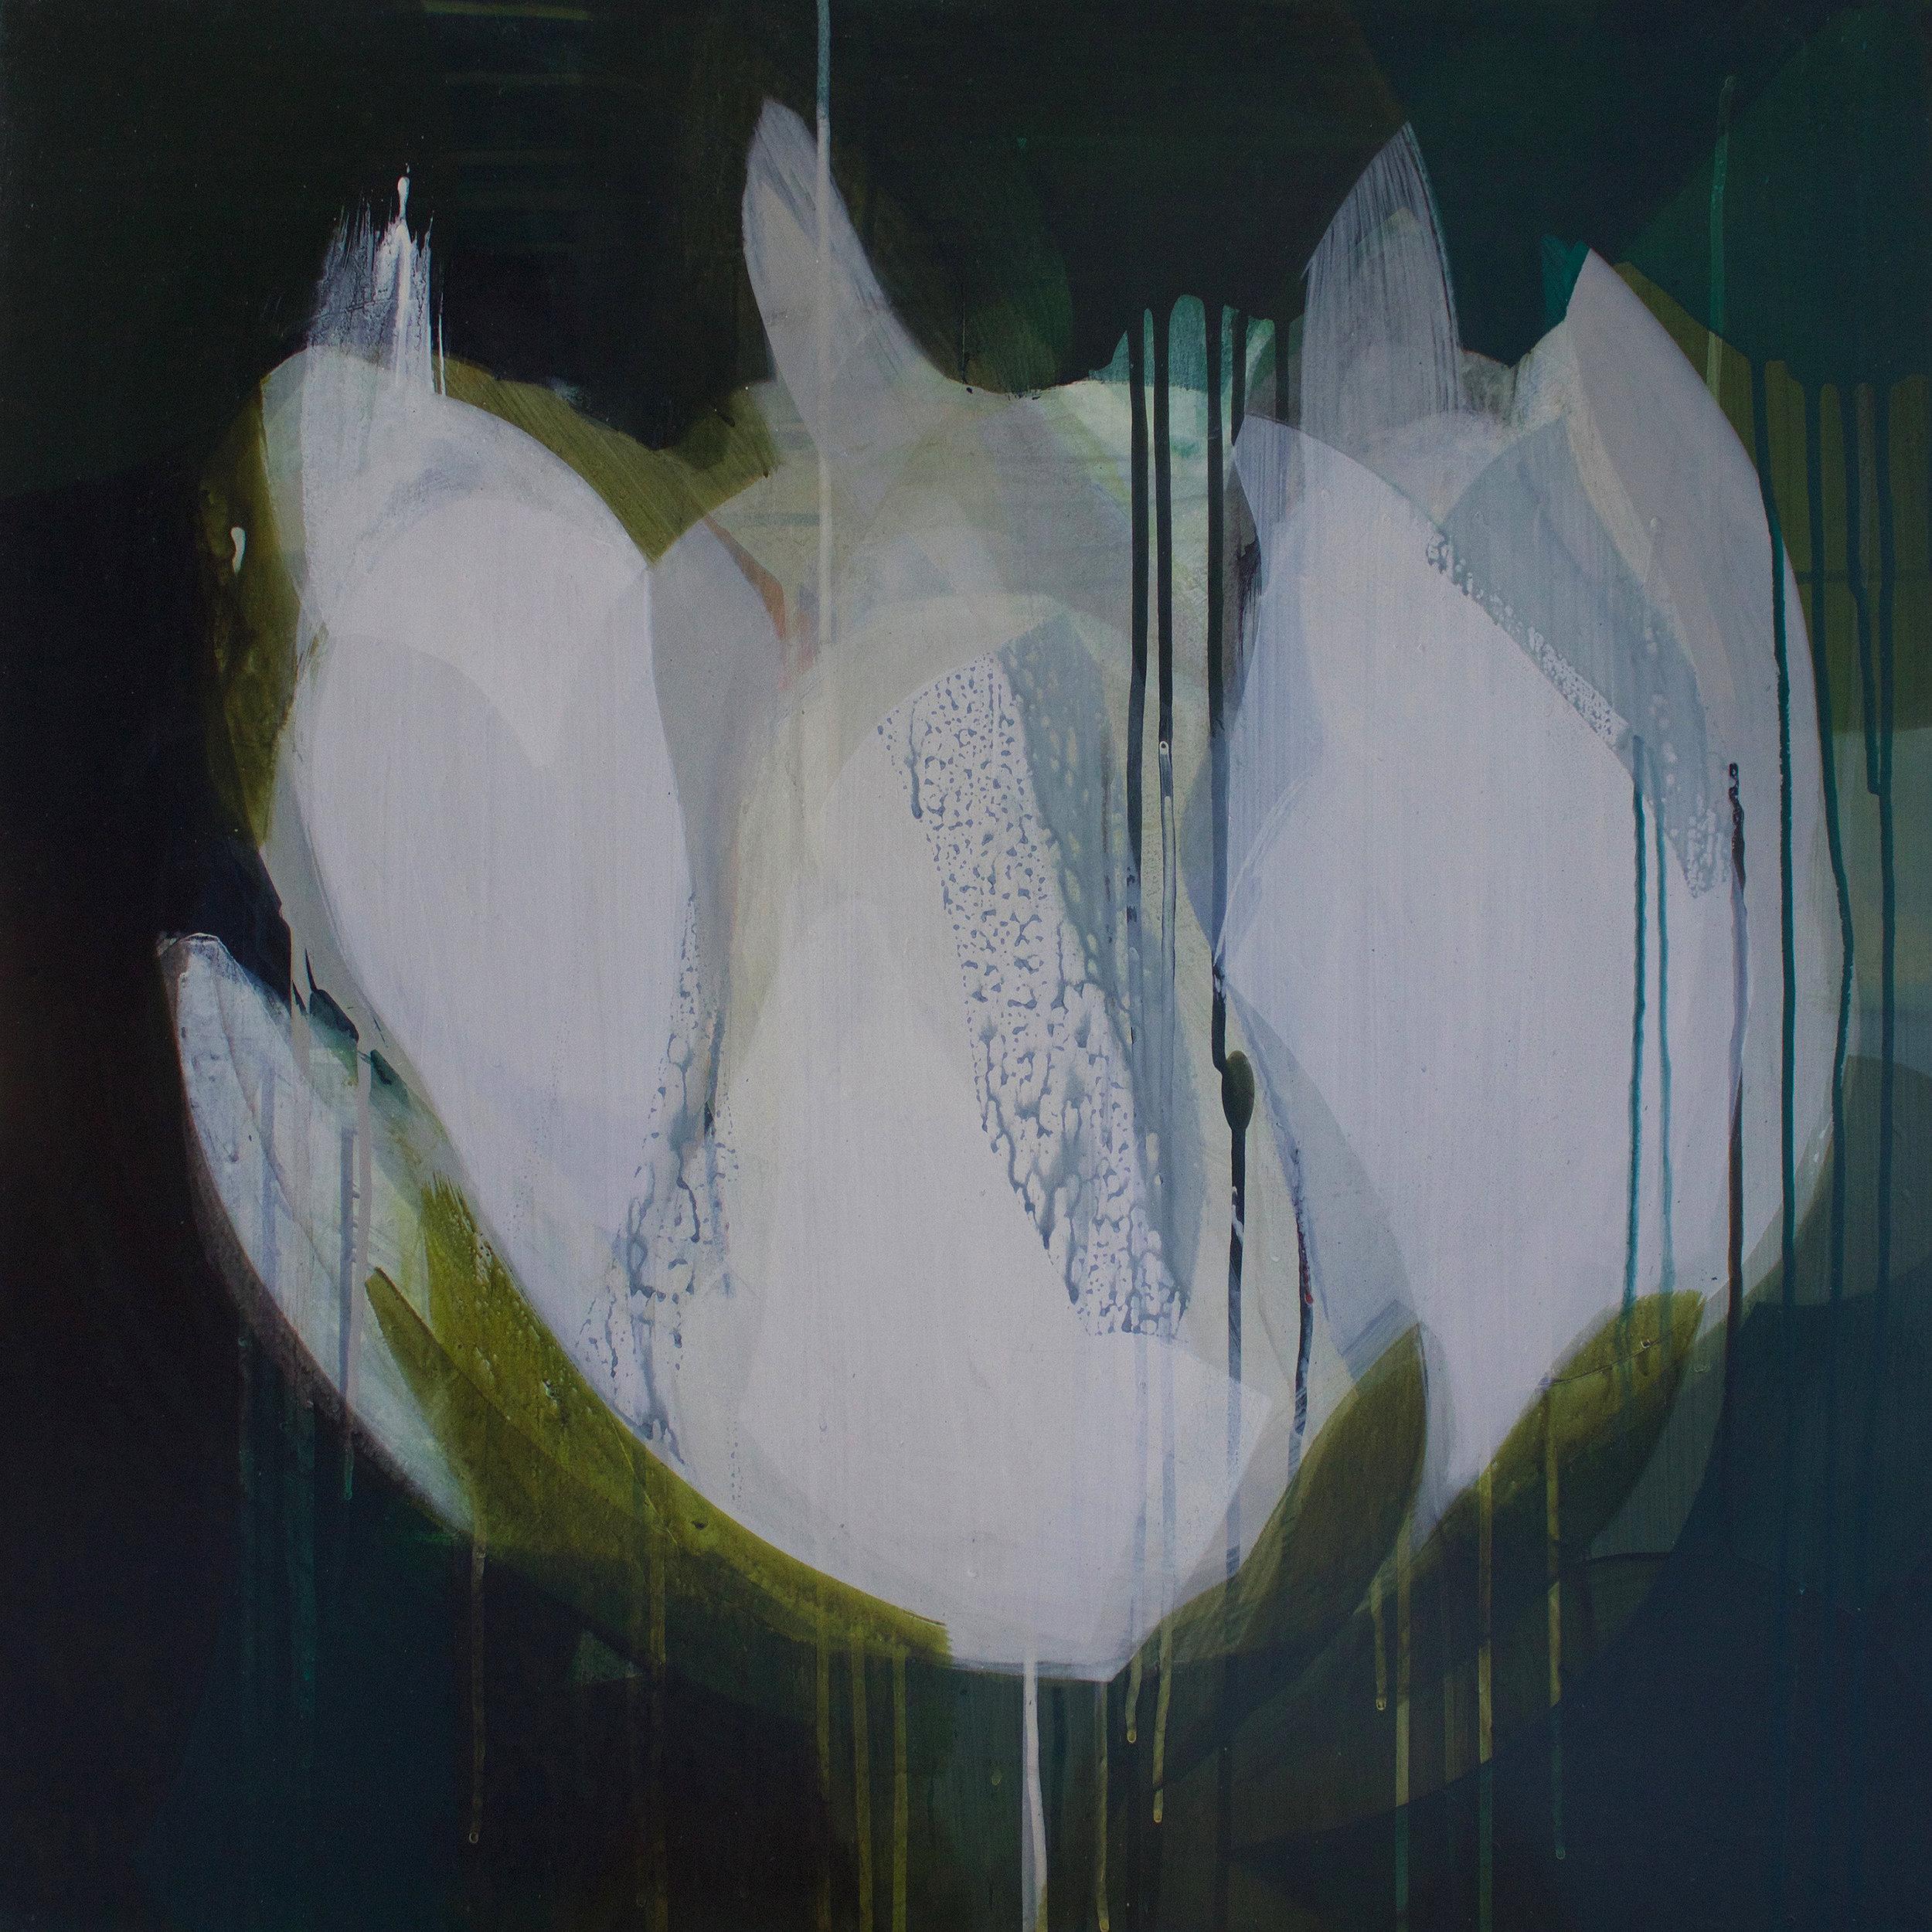 sandoz_sufawi1516_magnolia_24s.jpg